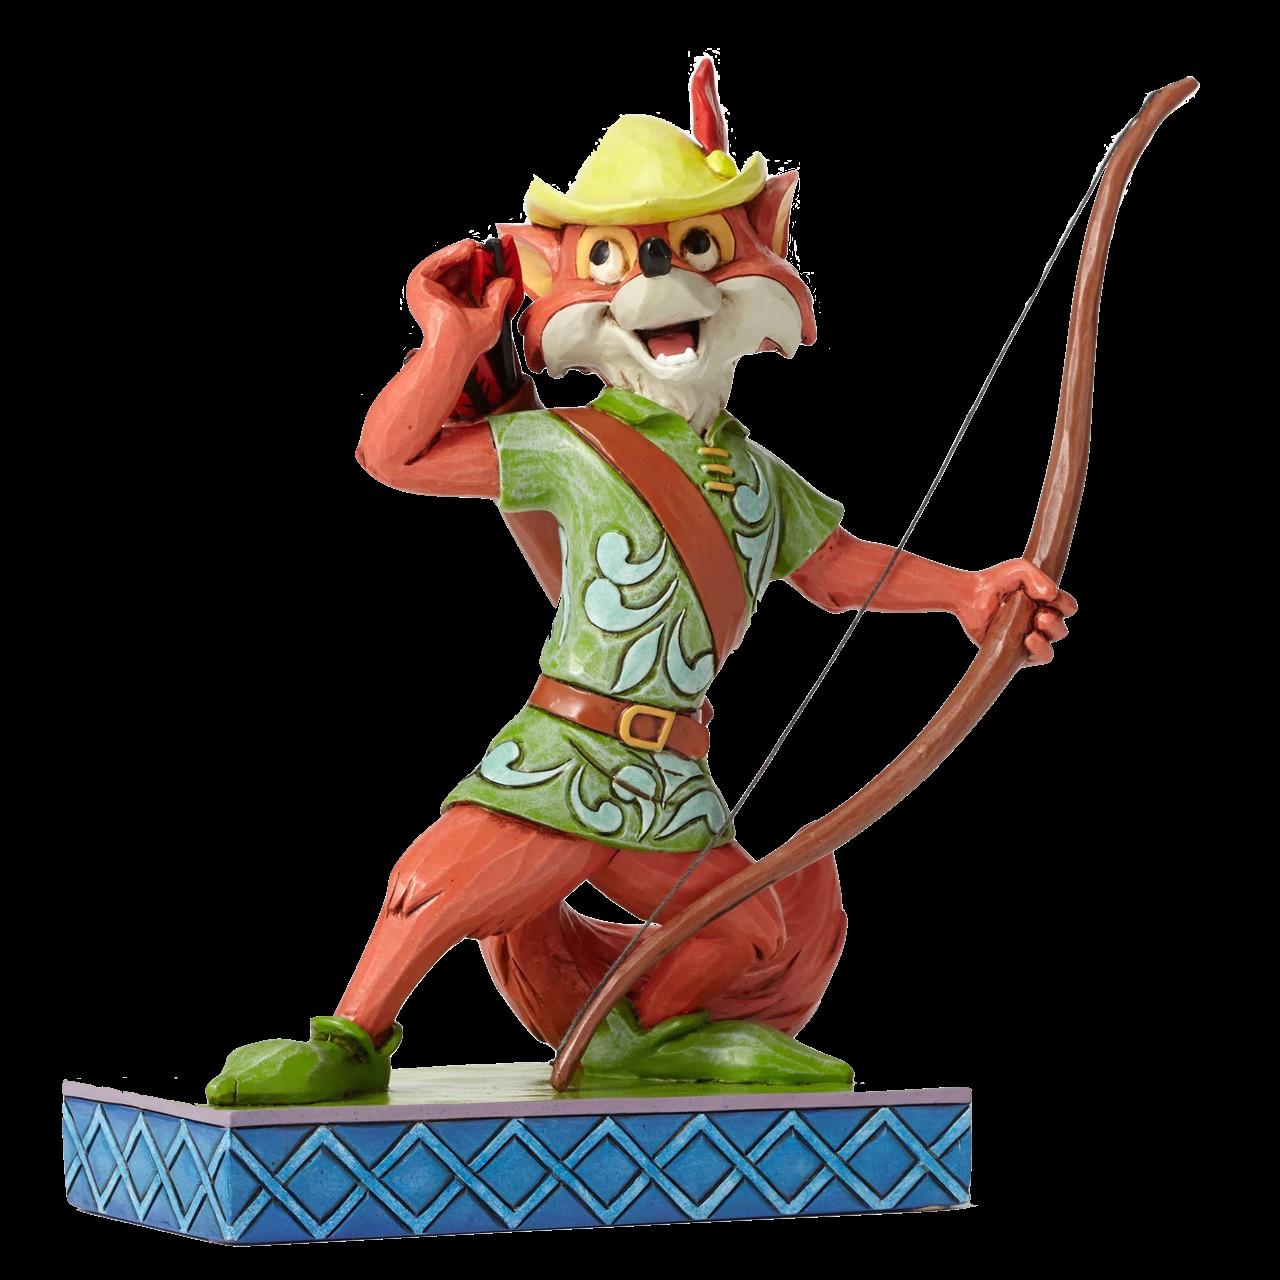 jim-shore-disney-traditions-robin-hood-toyslife-icon